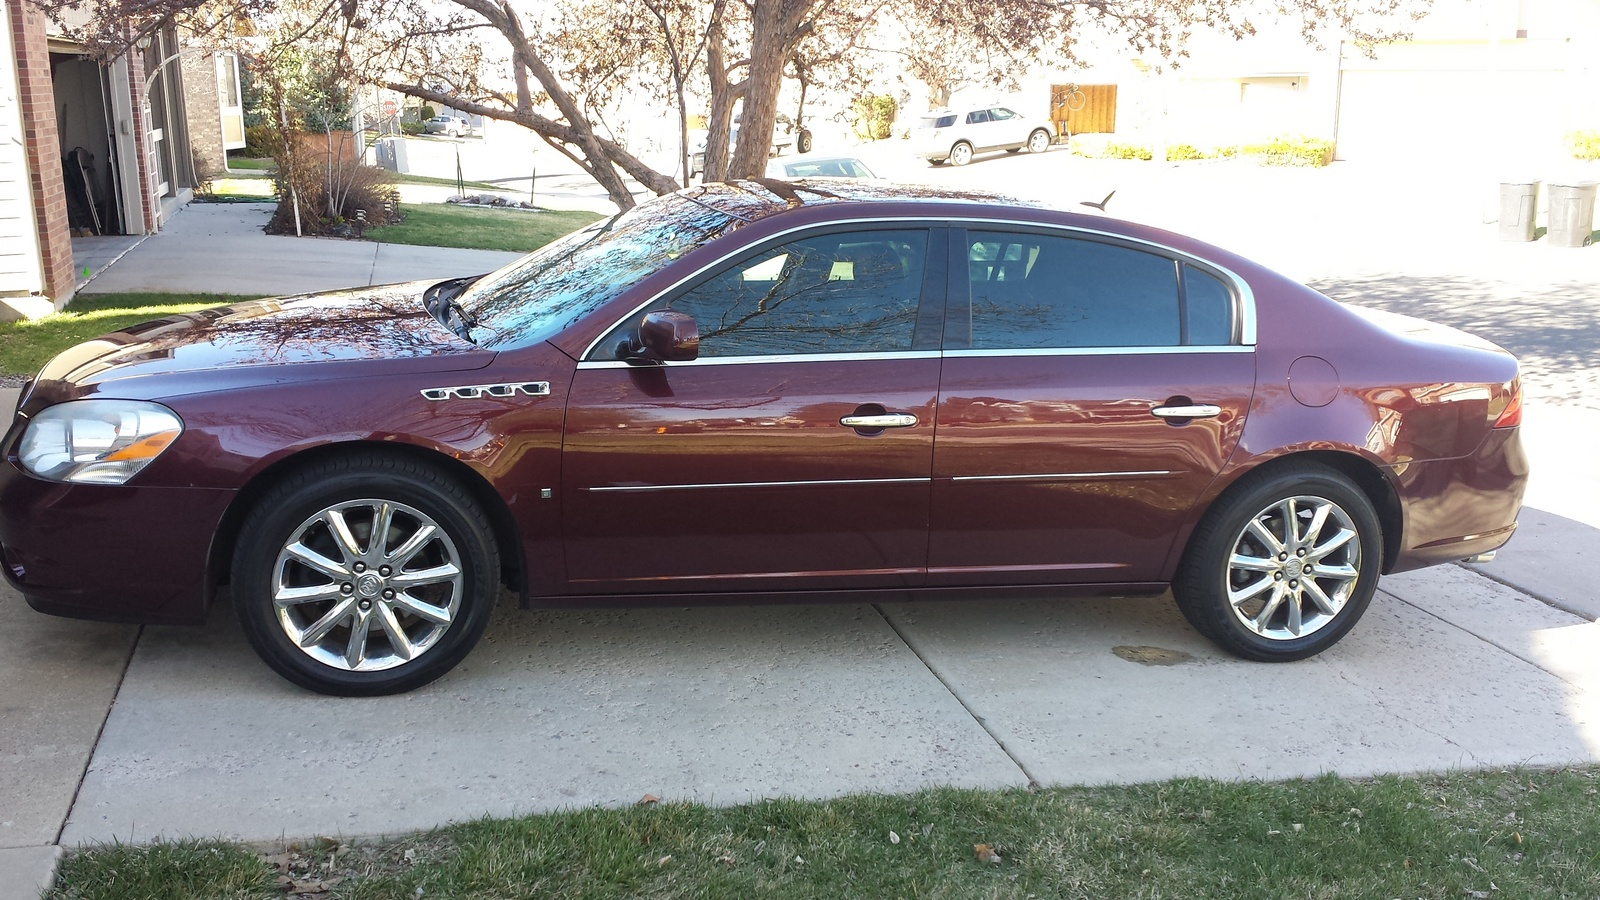 Used Buick Lucerne For Sale Colorado Springs, CO - CarGurus